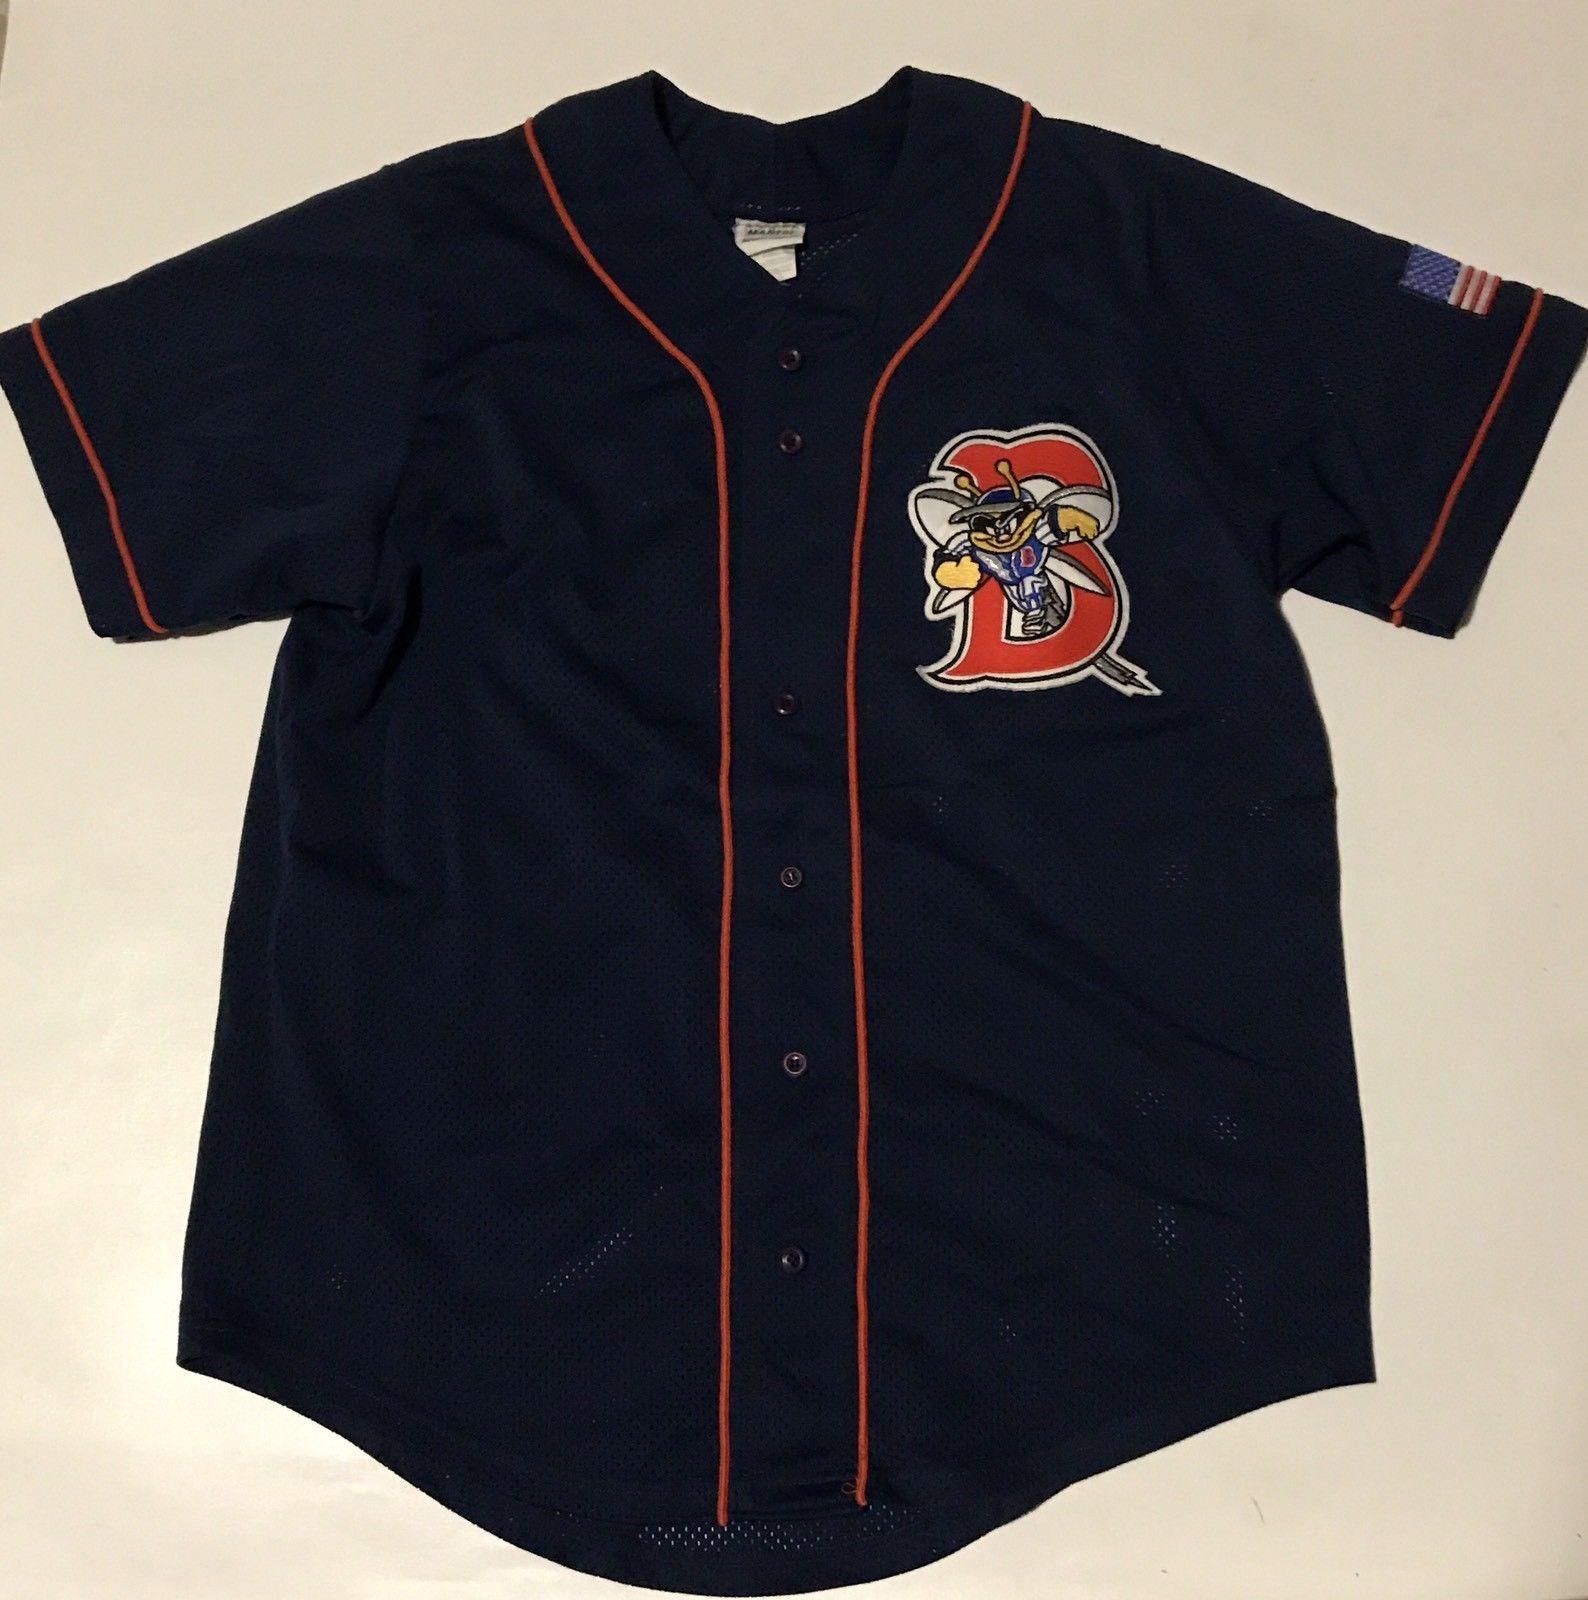 b61eb17b8 Vintage Binghamton Mets Game Used Jersey 6 Men s Medium